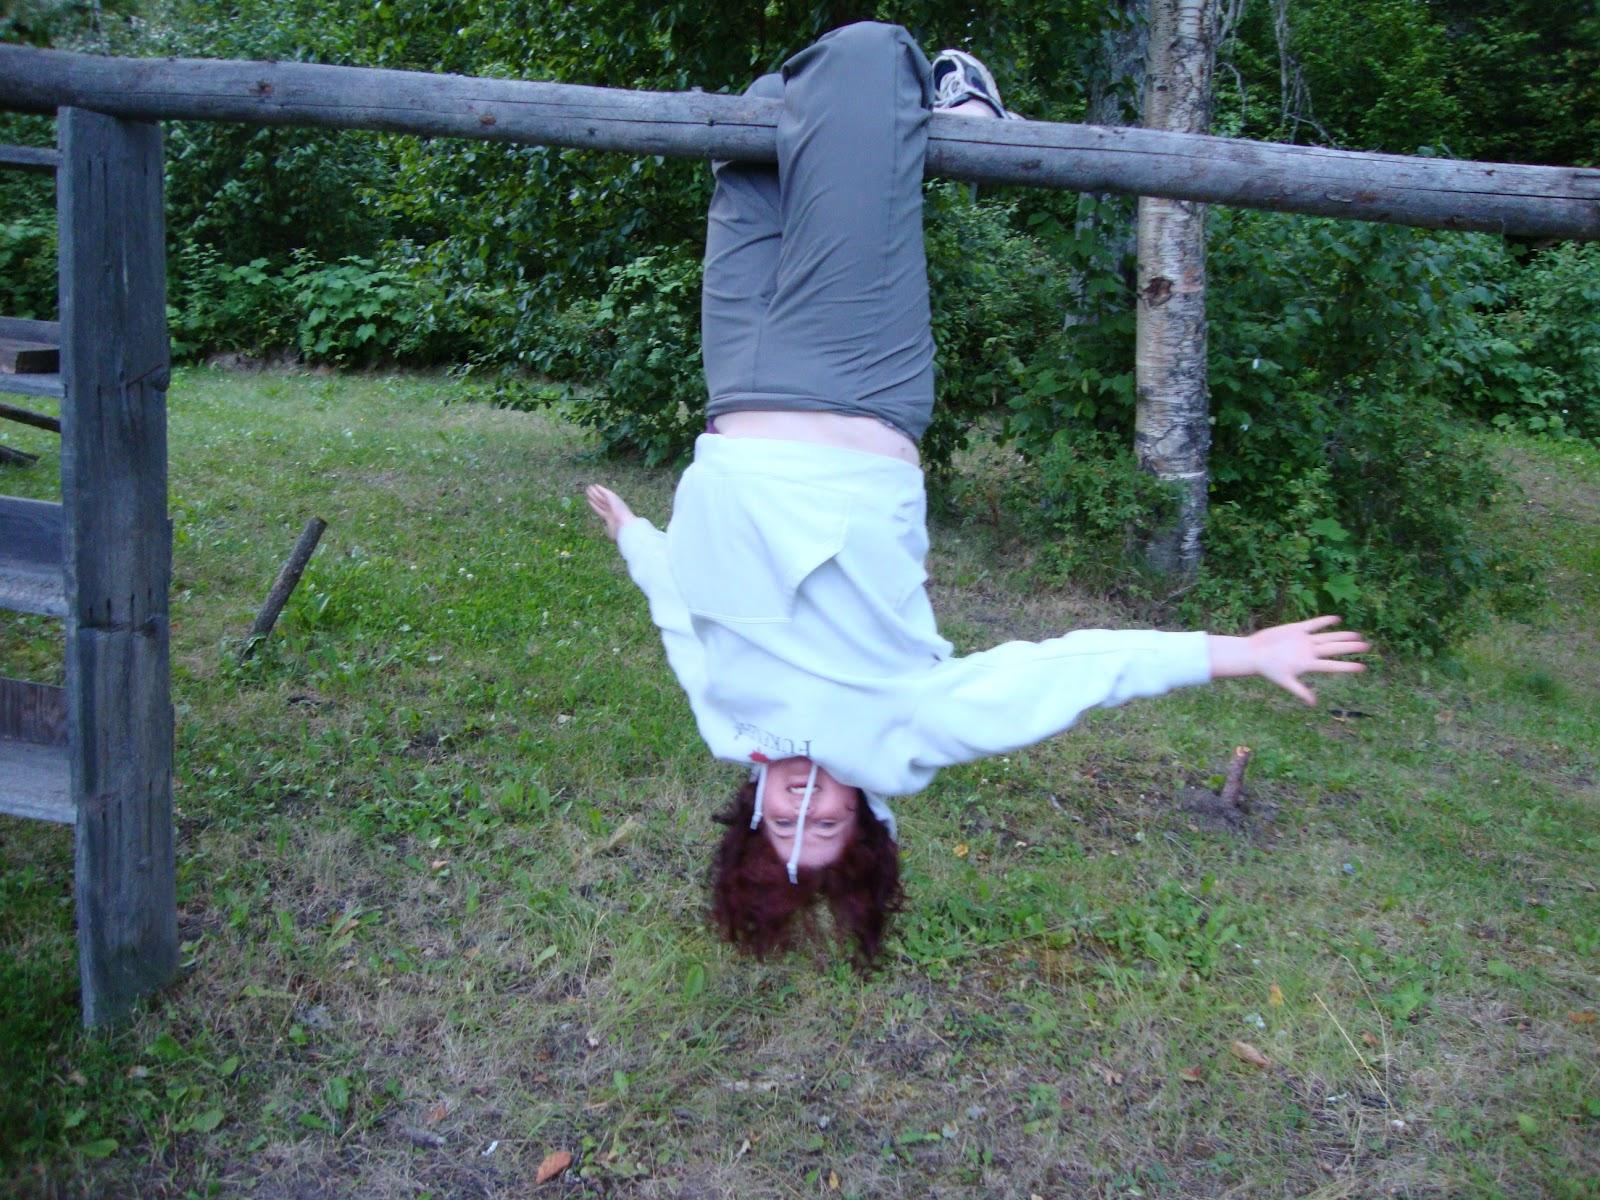 Lindsey Stirling Yoga Pants | www.imgkid.com - The Image ...